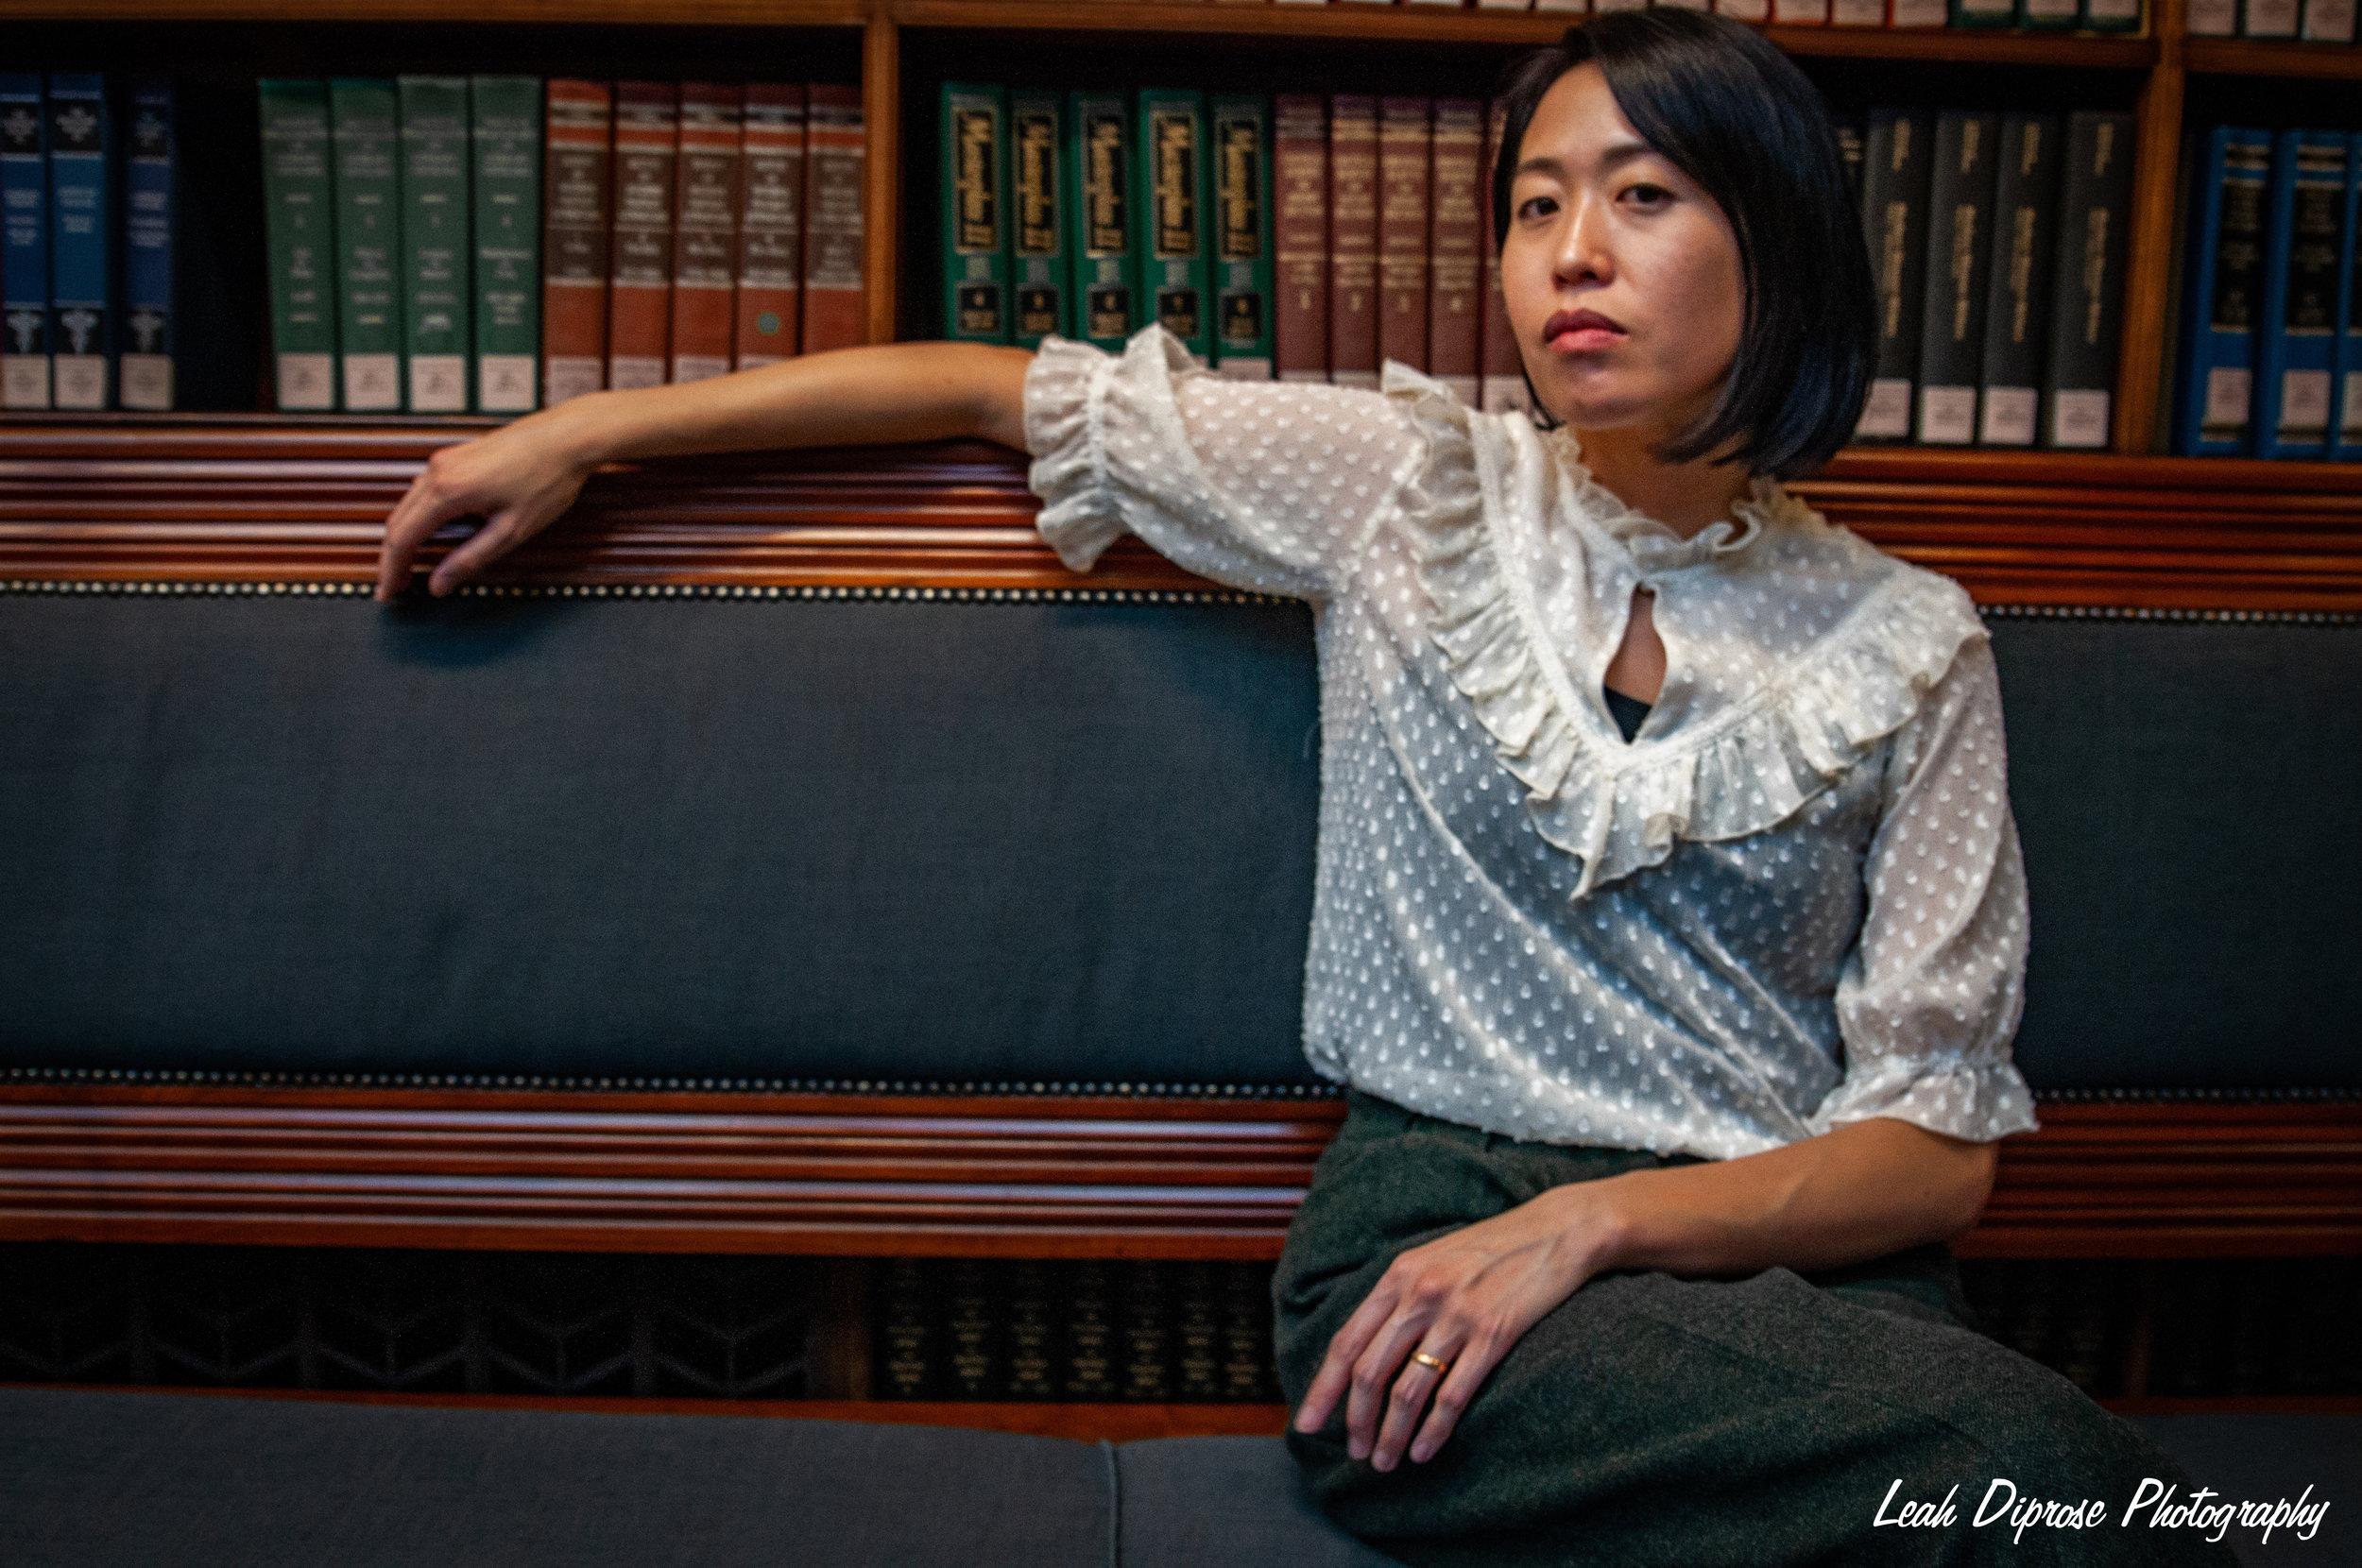 Leah Diprose Photography image-0578.jpg